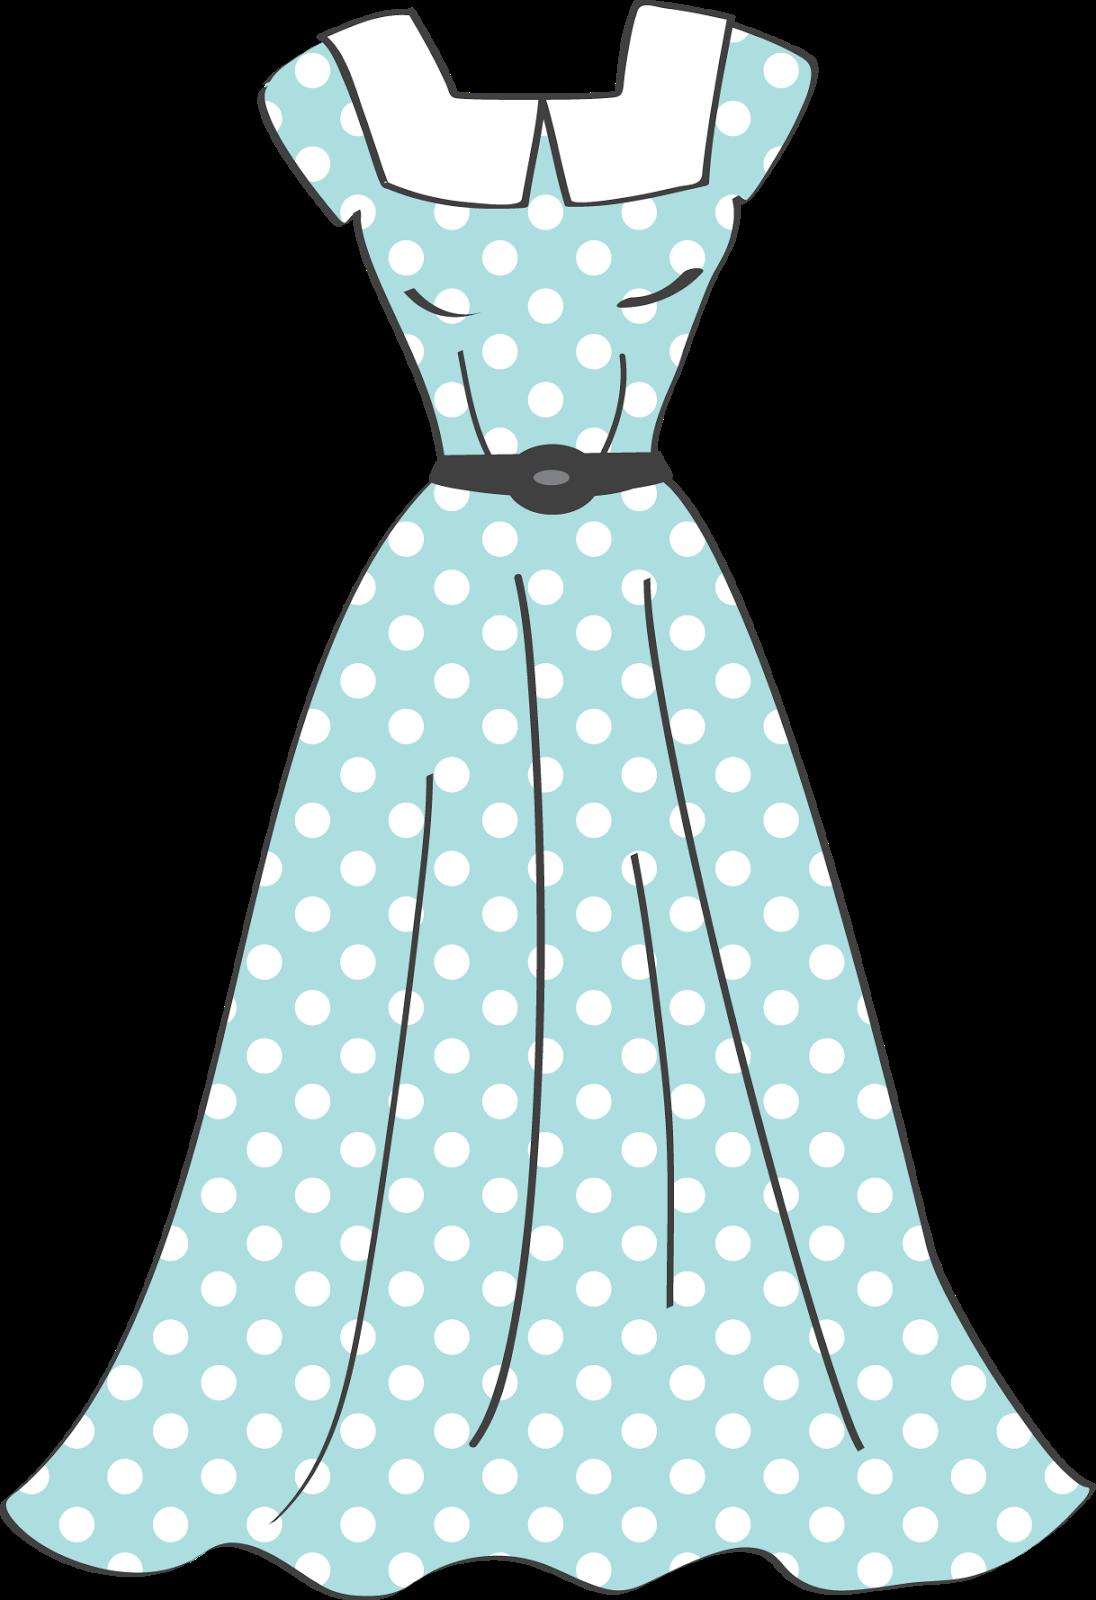 Fashion clipart mini dress. Sgblogosfera mar a jos